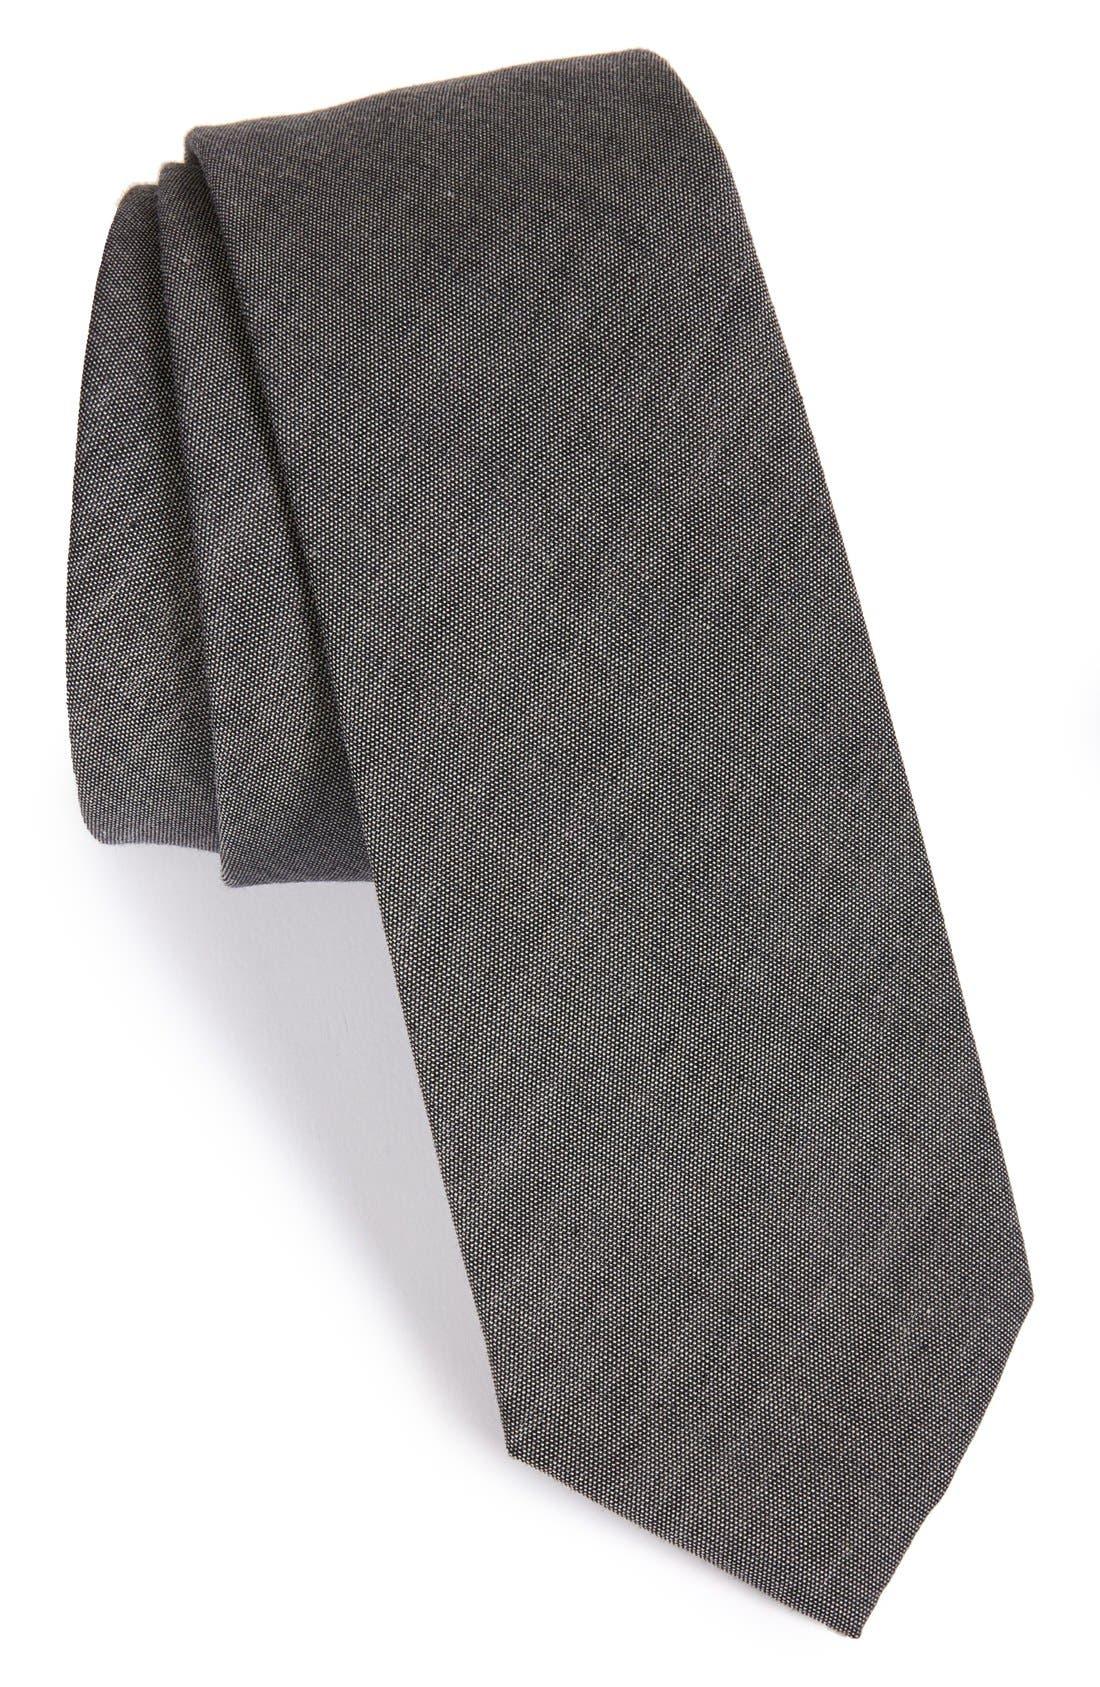 Cotton Tie,                             Main thumbnail 1, color,                             WARM GREY